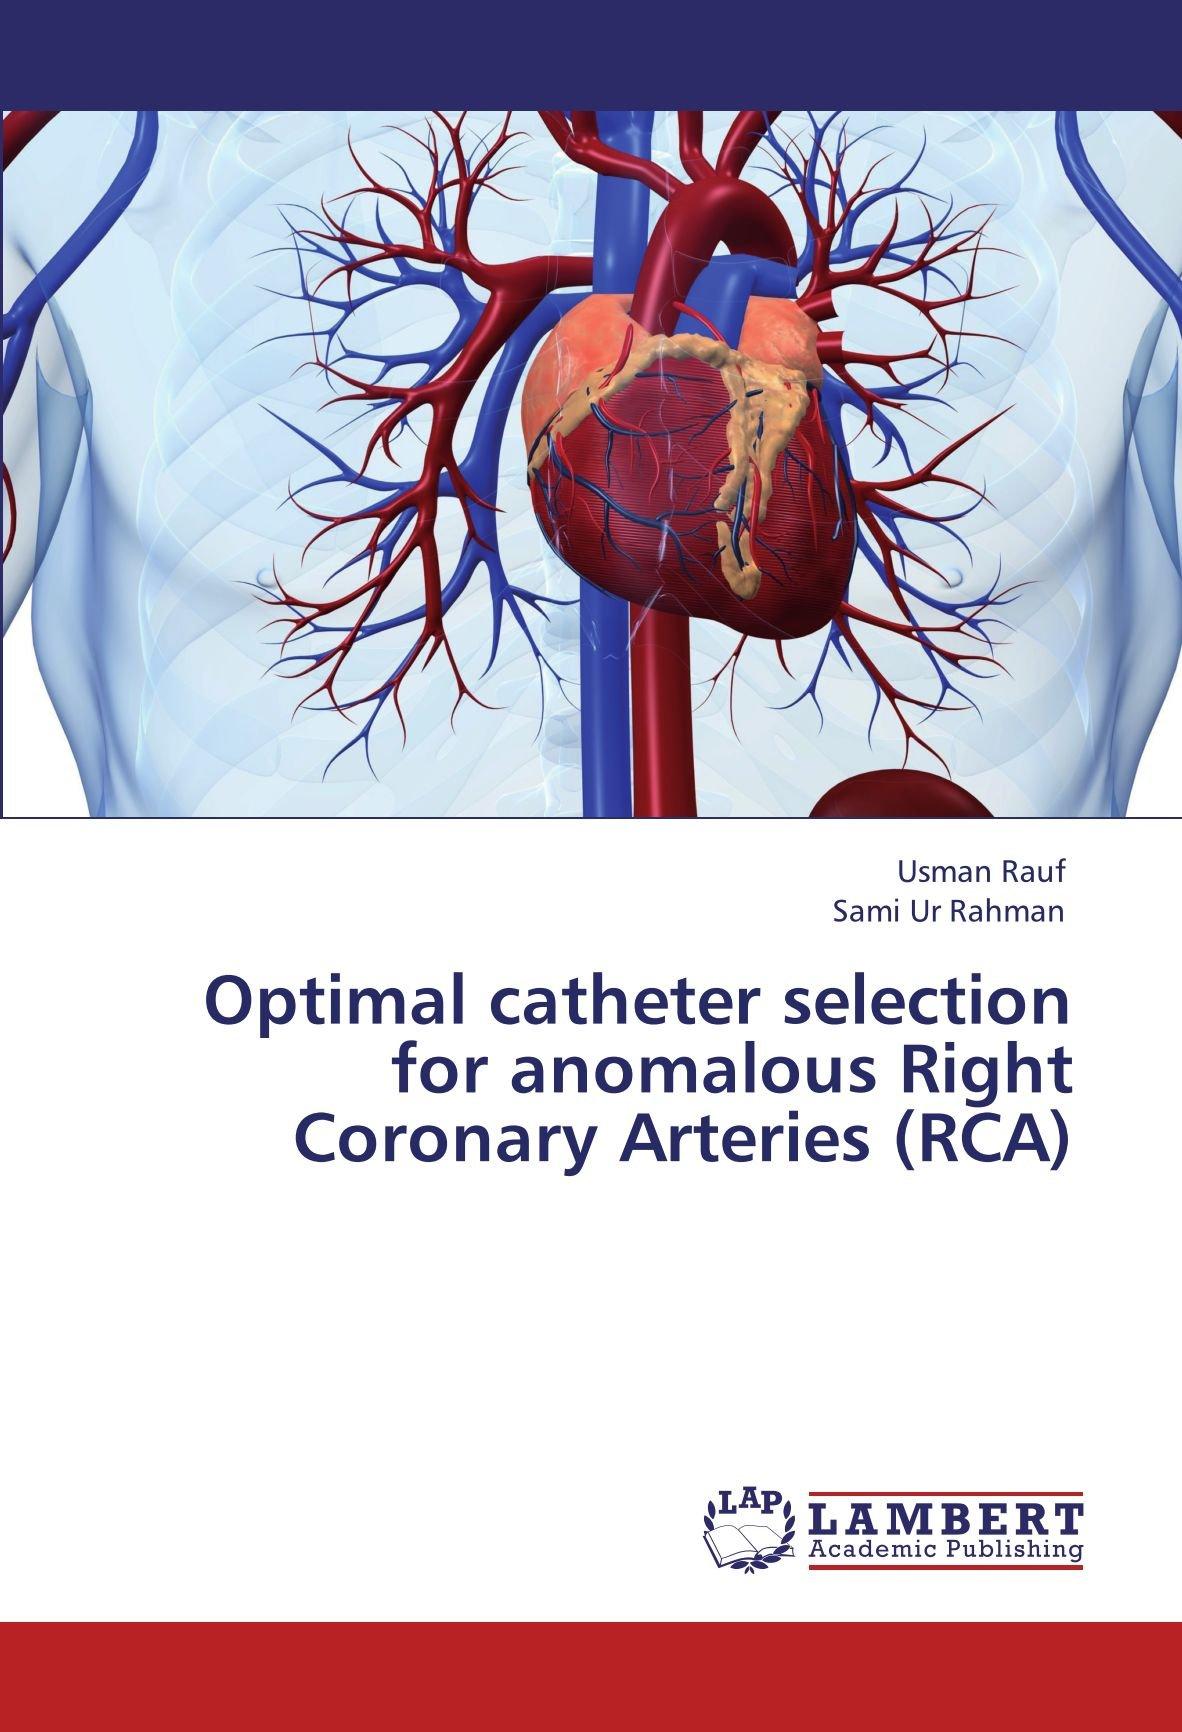 Optimal catheter selection for anomalous Right Coronary Arteries ...